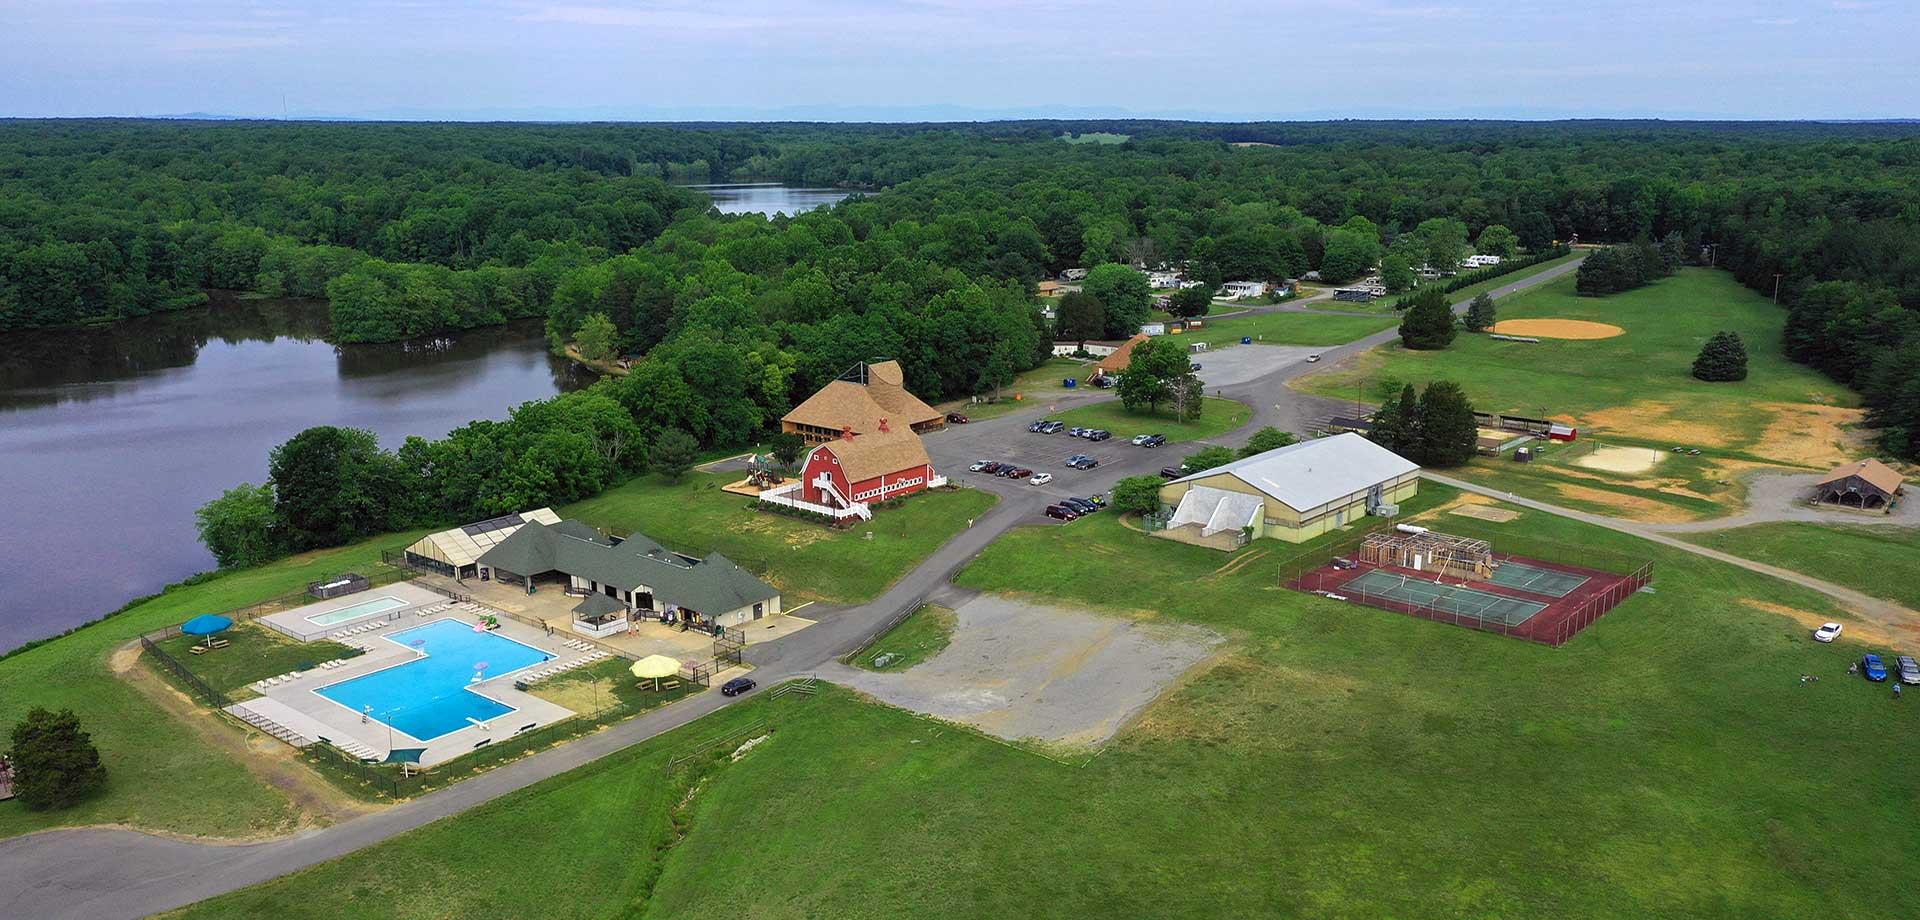 Wilderness Presidential Resort Aerial Photo